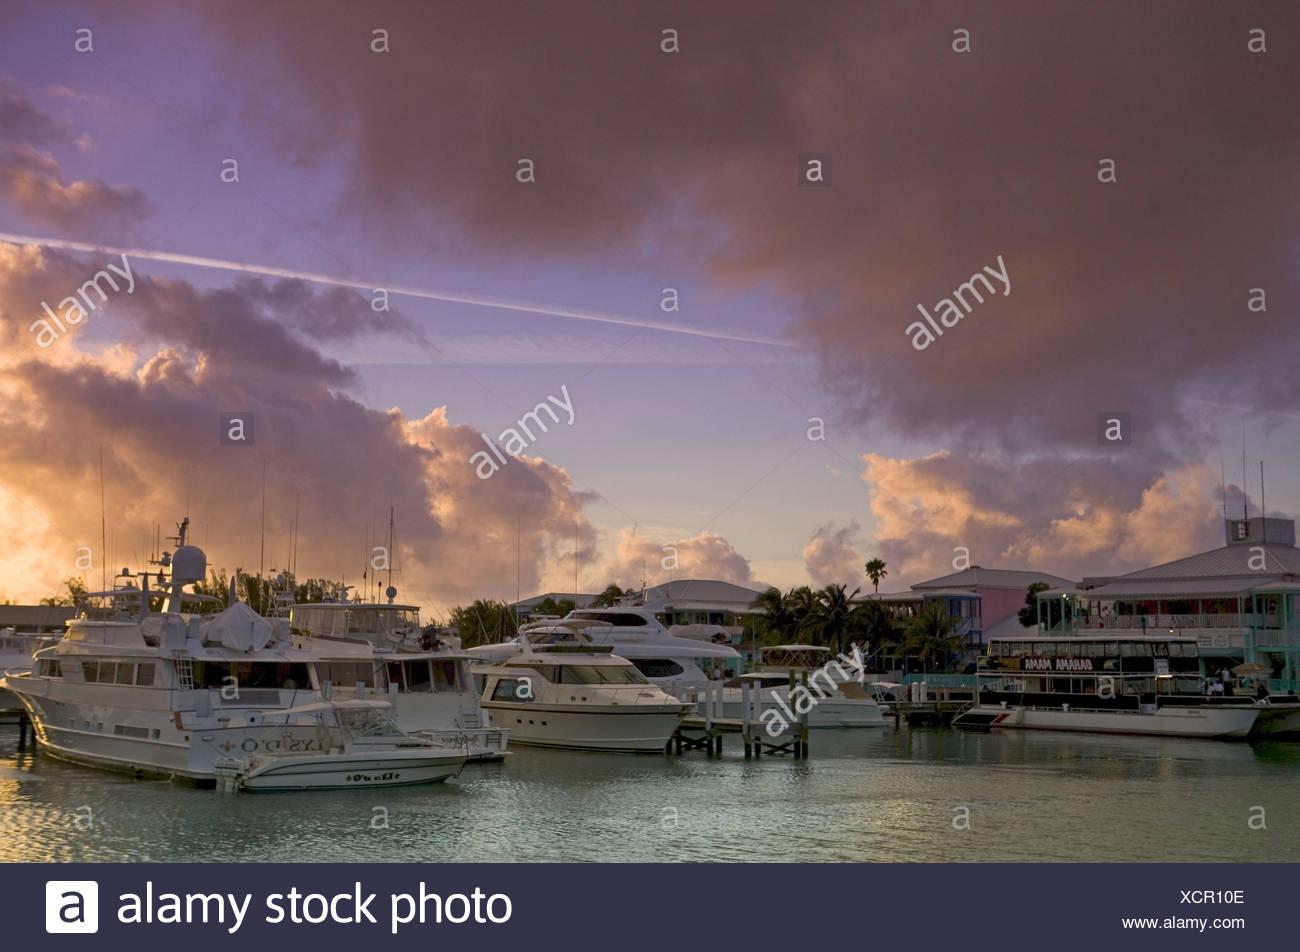 Bahamas, Bootshafen, Boote, Sonnenuntergang Stock Photo